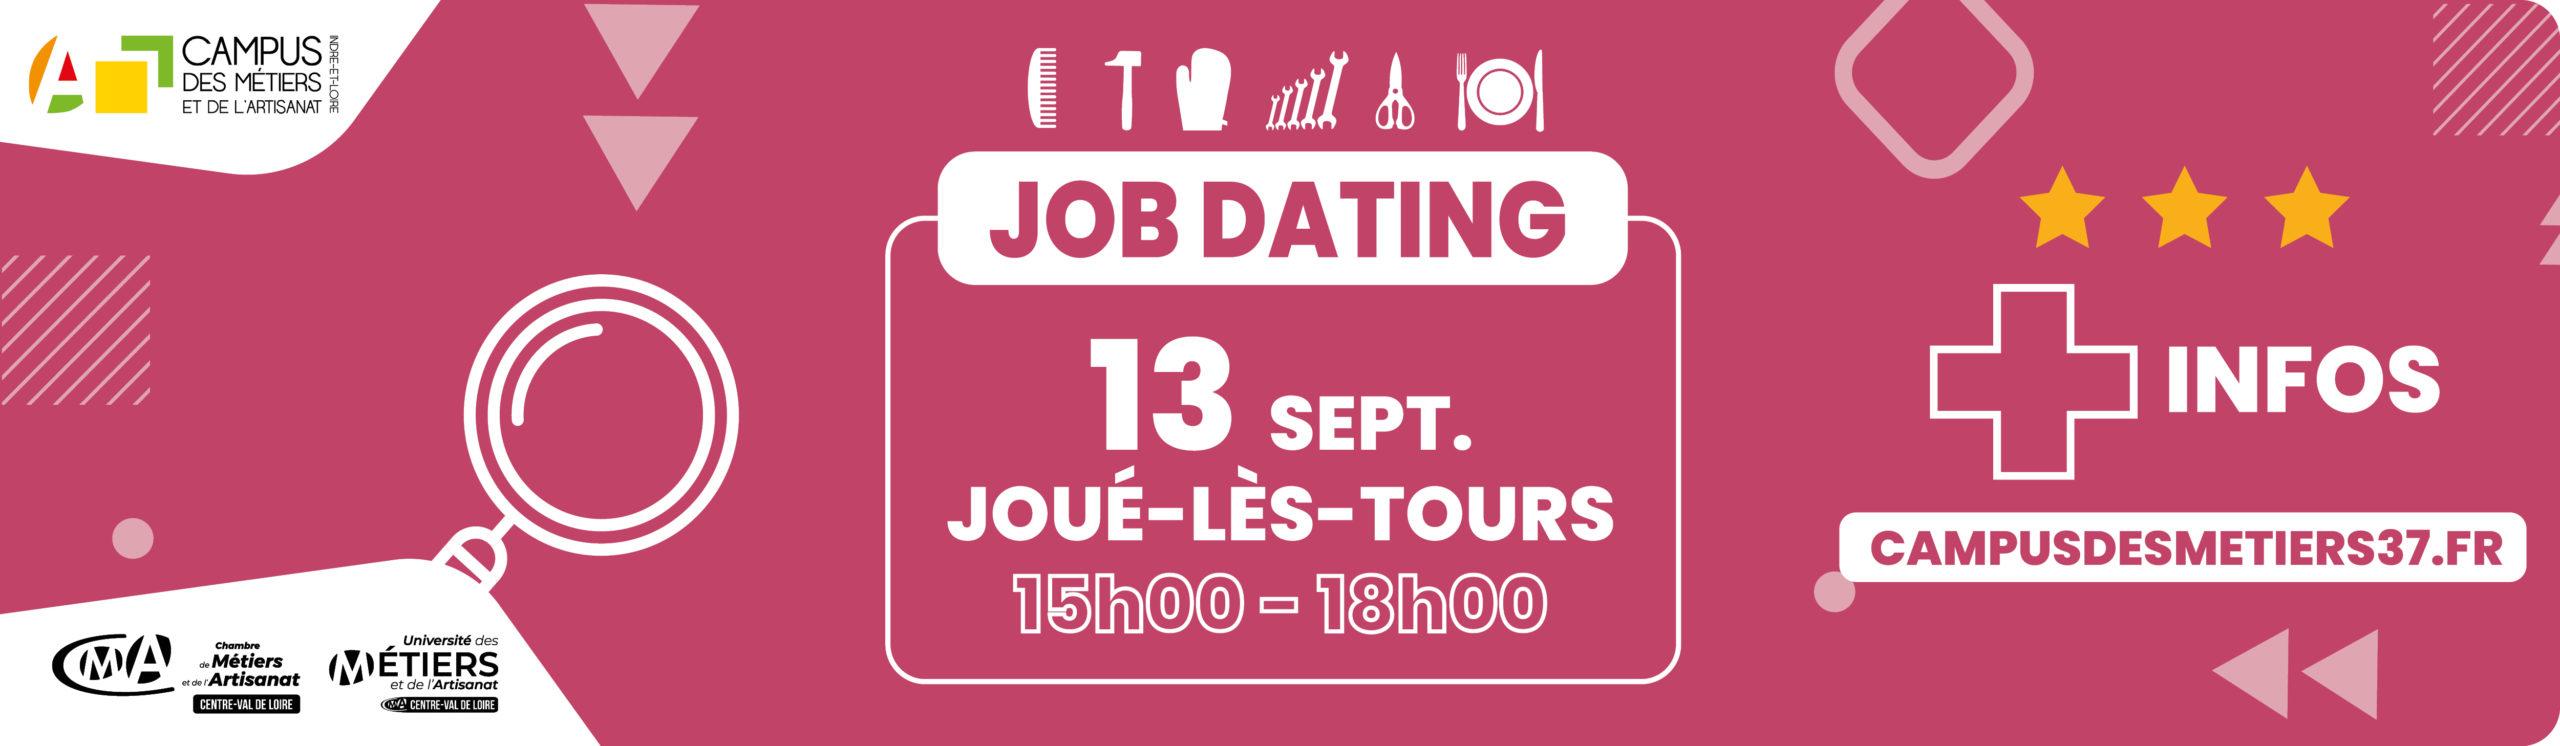 job dating campus des métiers 37